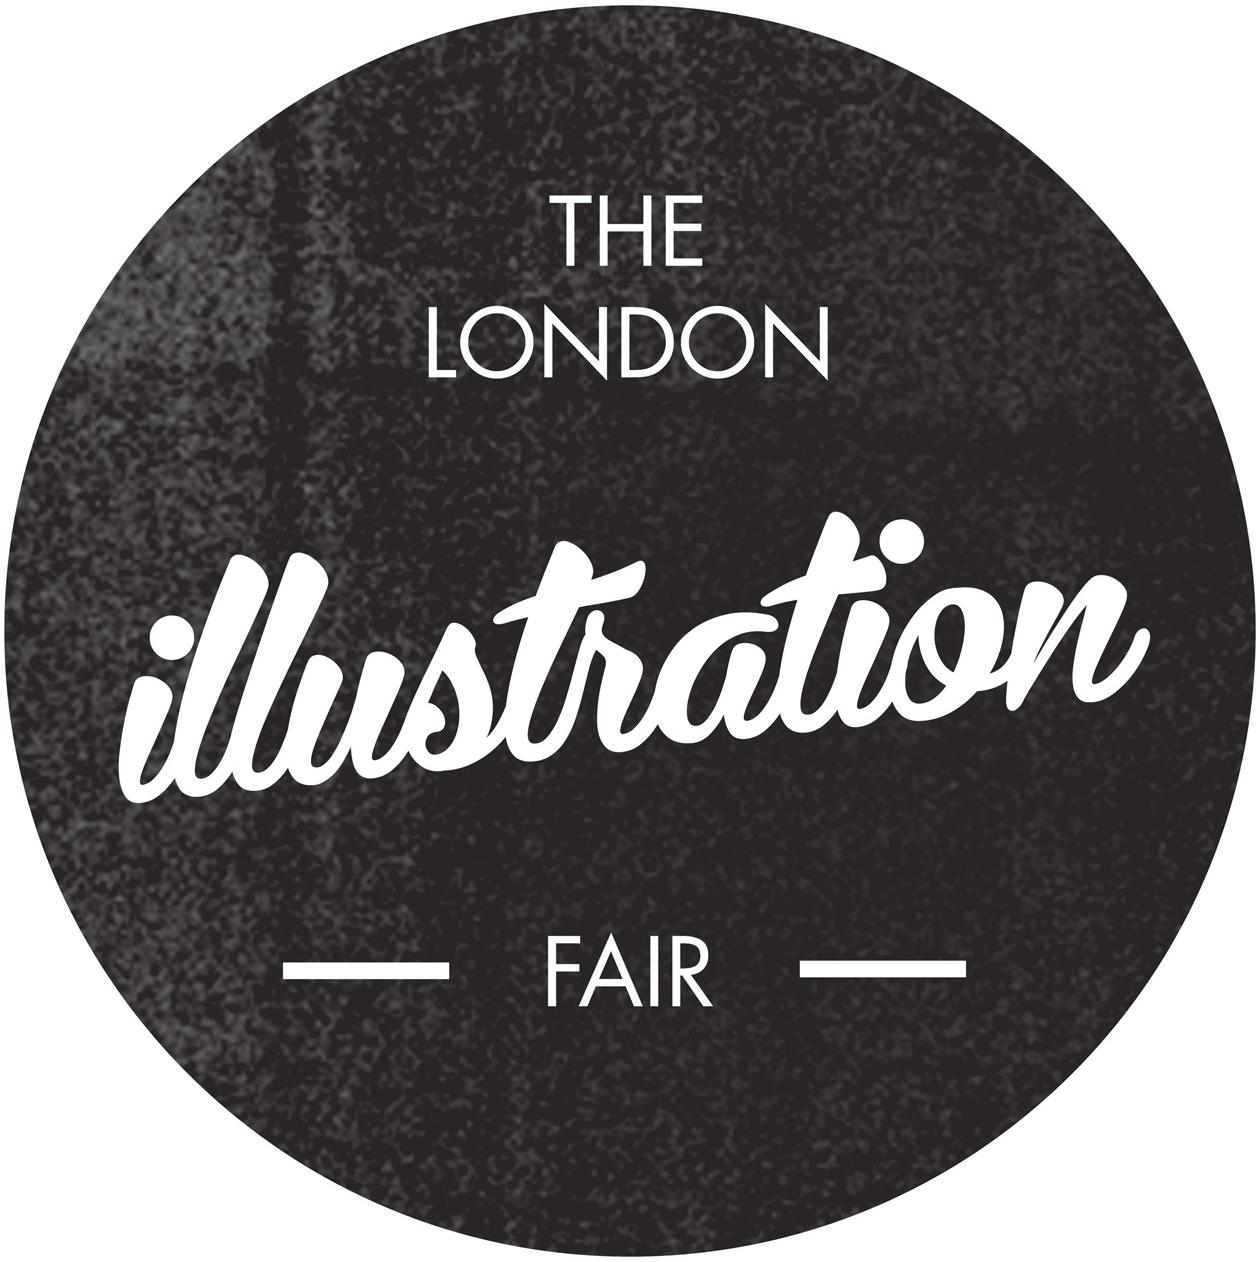 The London Illustration Fair